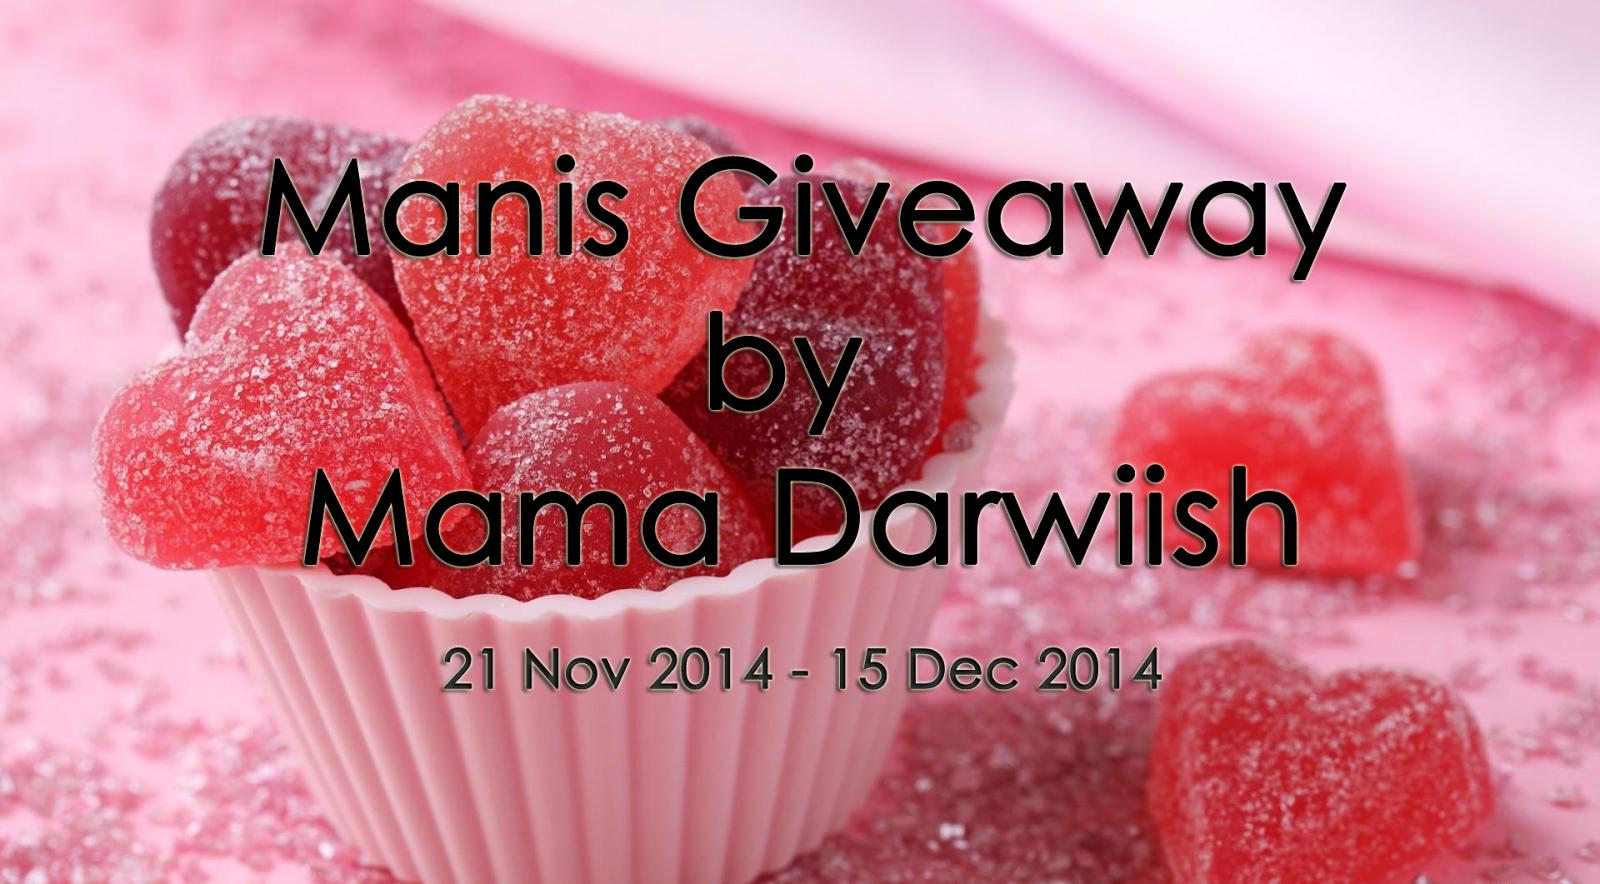 http://mamadarwiish.blogspot.com/2014/11/manis-giveaway-by-mama-darwiish.html